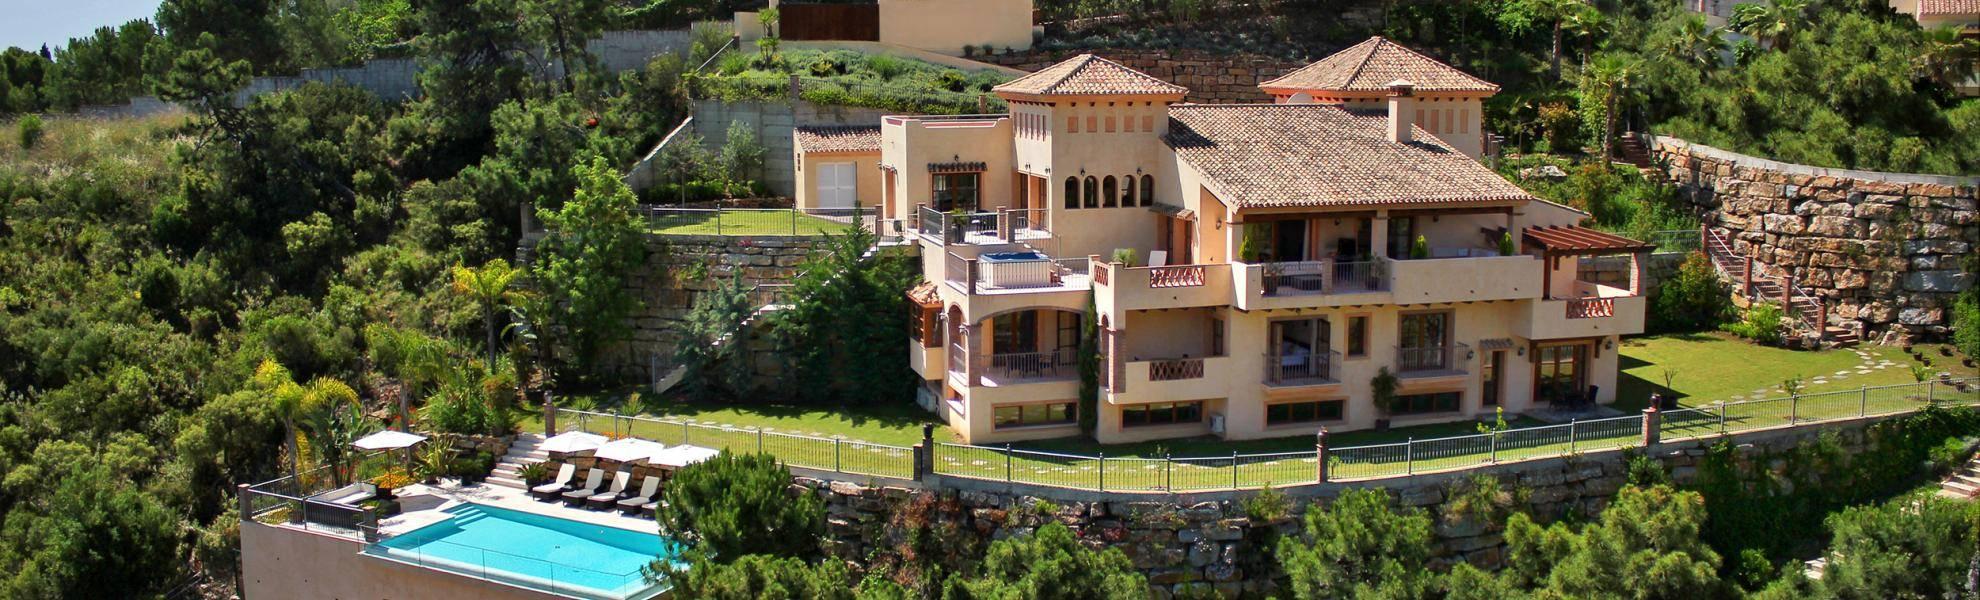 Hacienda Floriana